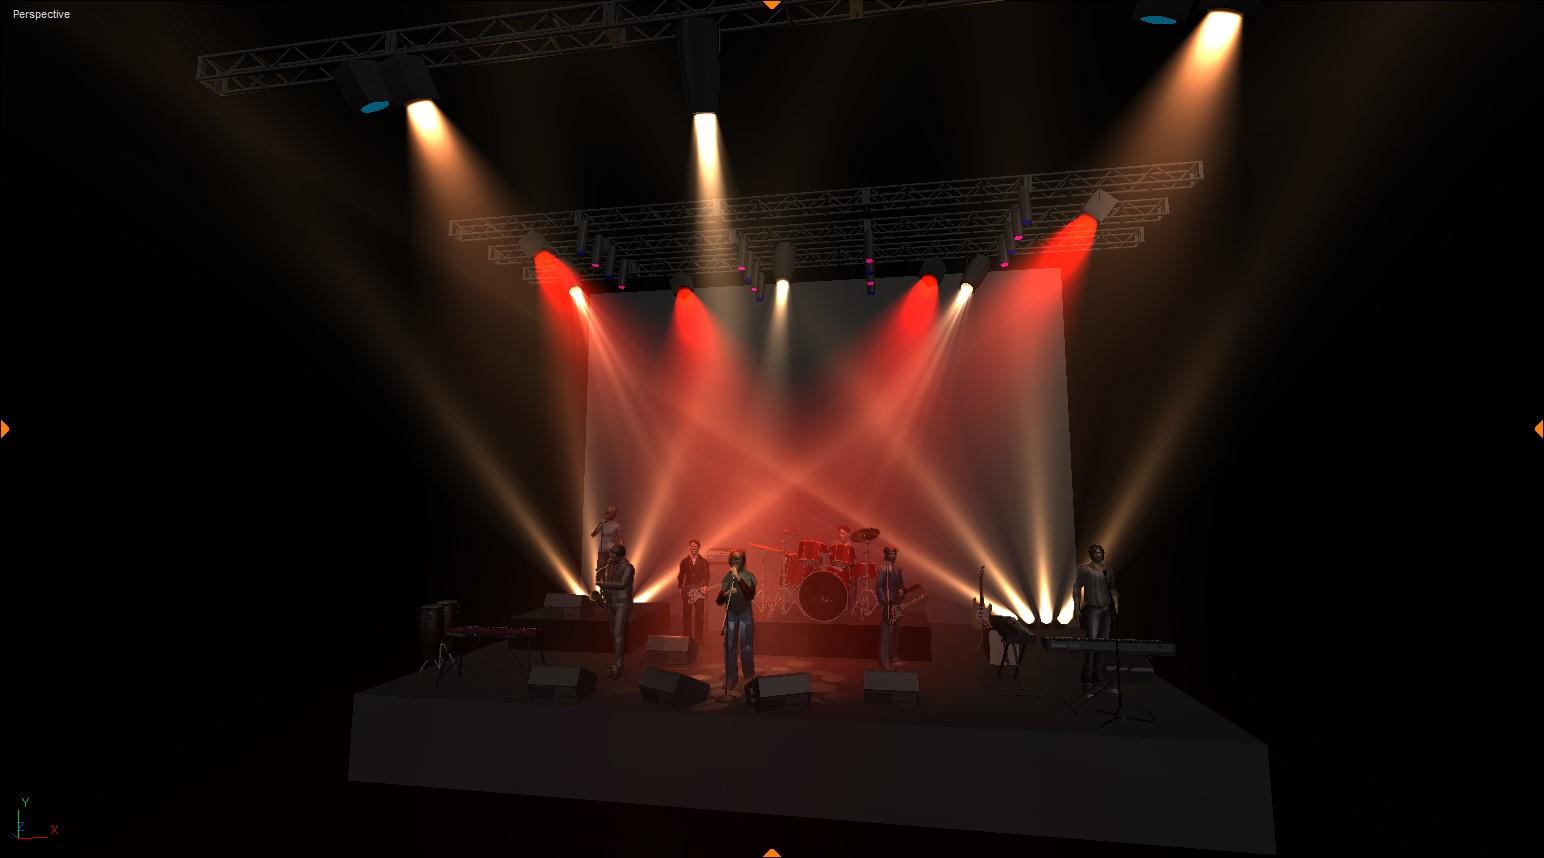 https://autocadtec.nl/wp-content/uploads/2021/02/Celebrating-the-music-of-Joe-Cocker-Theater-r1.jpg